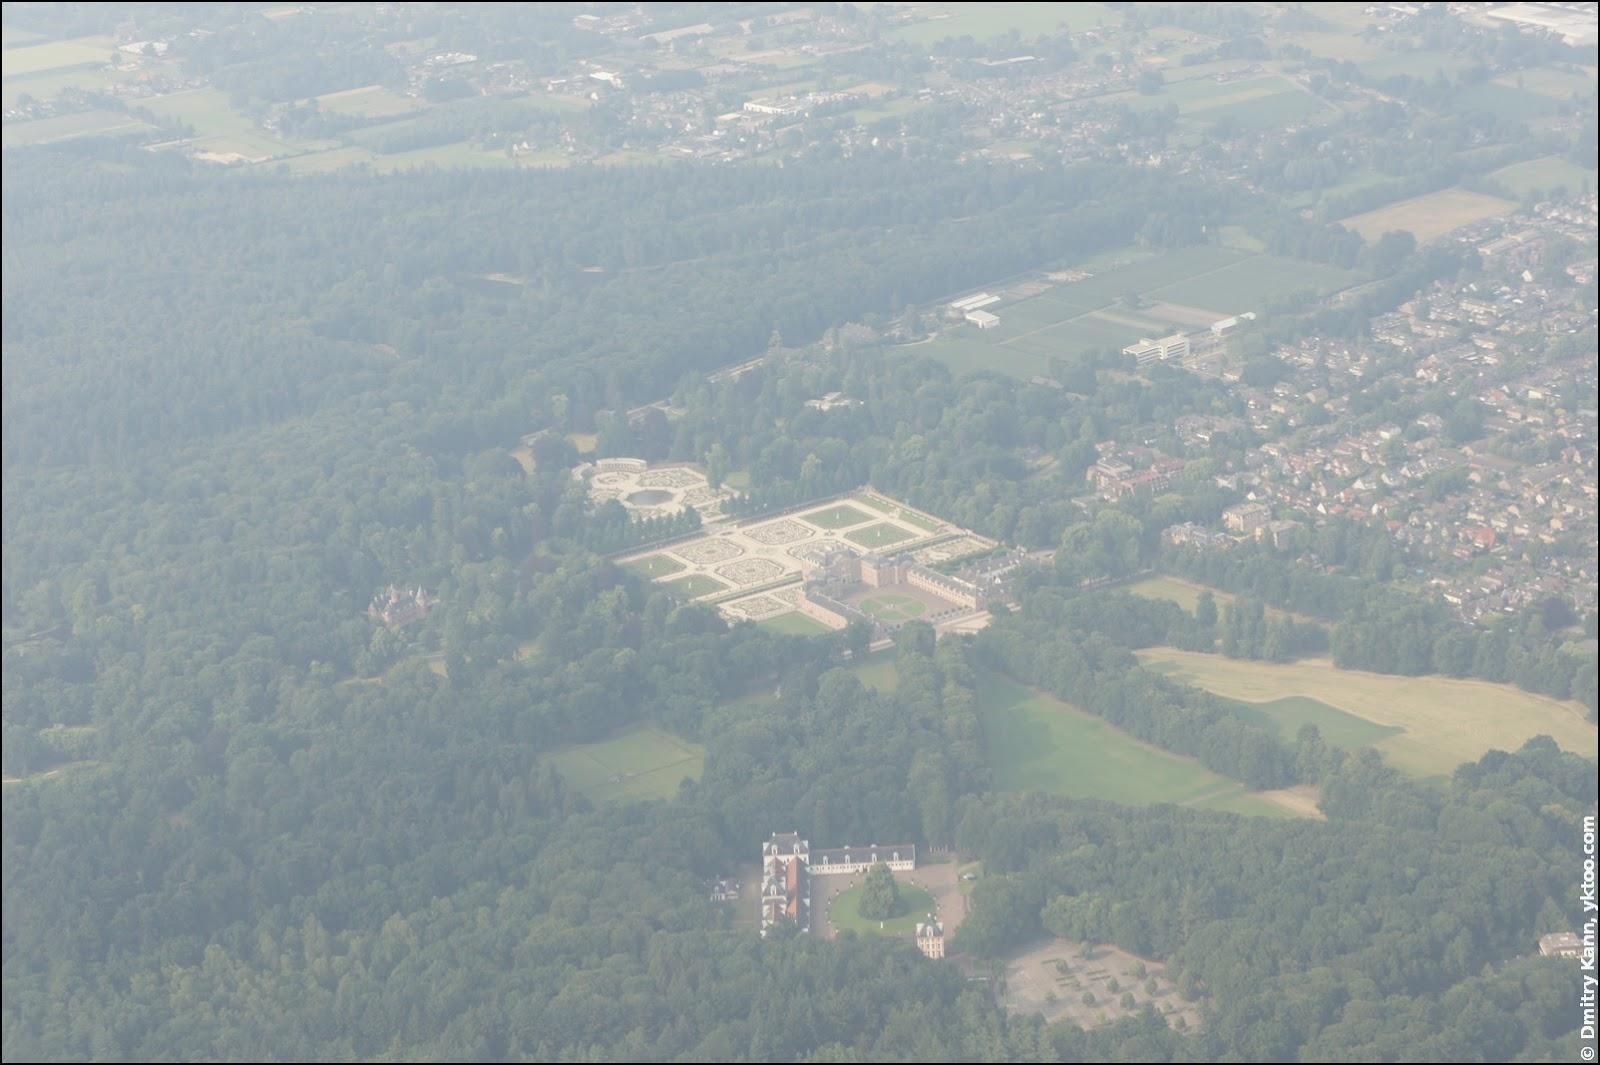 The Het Loo Palace.